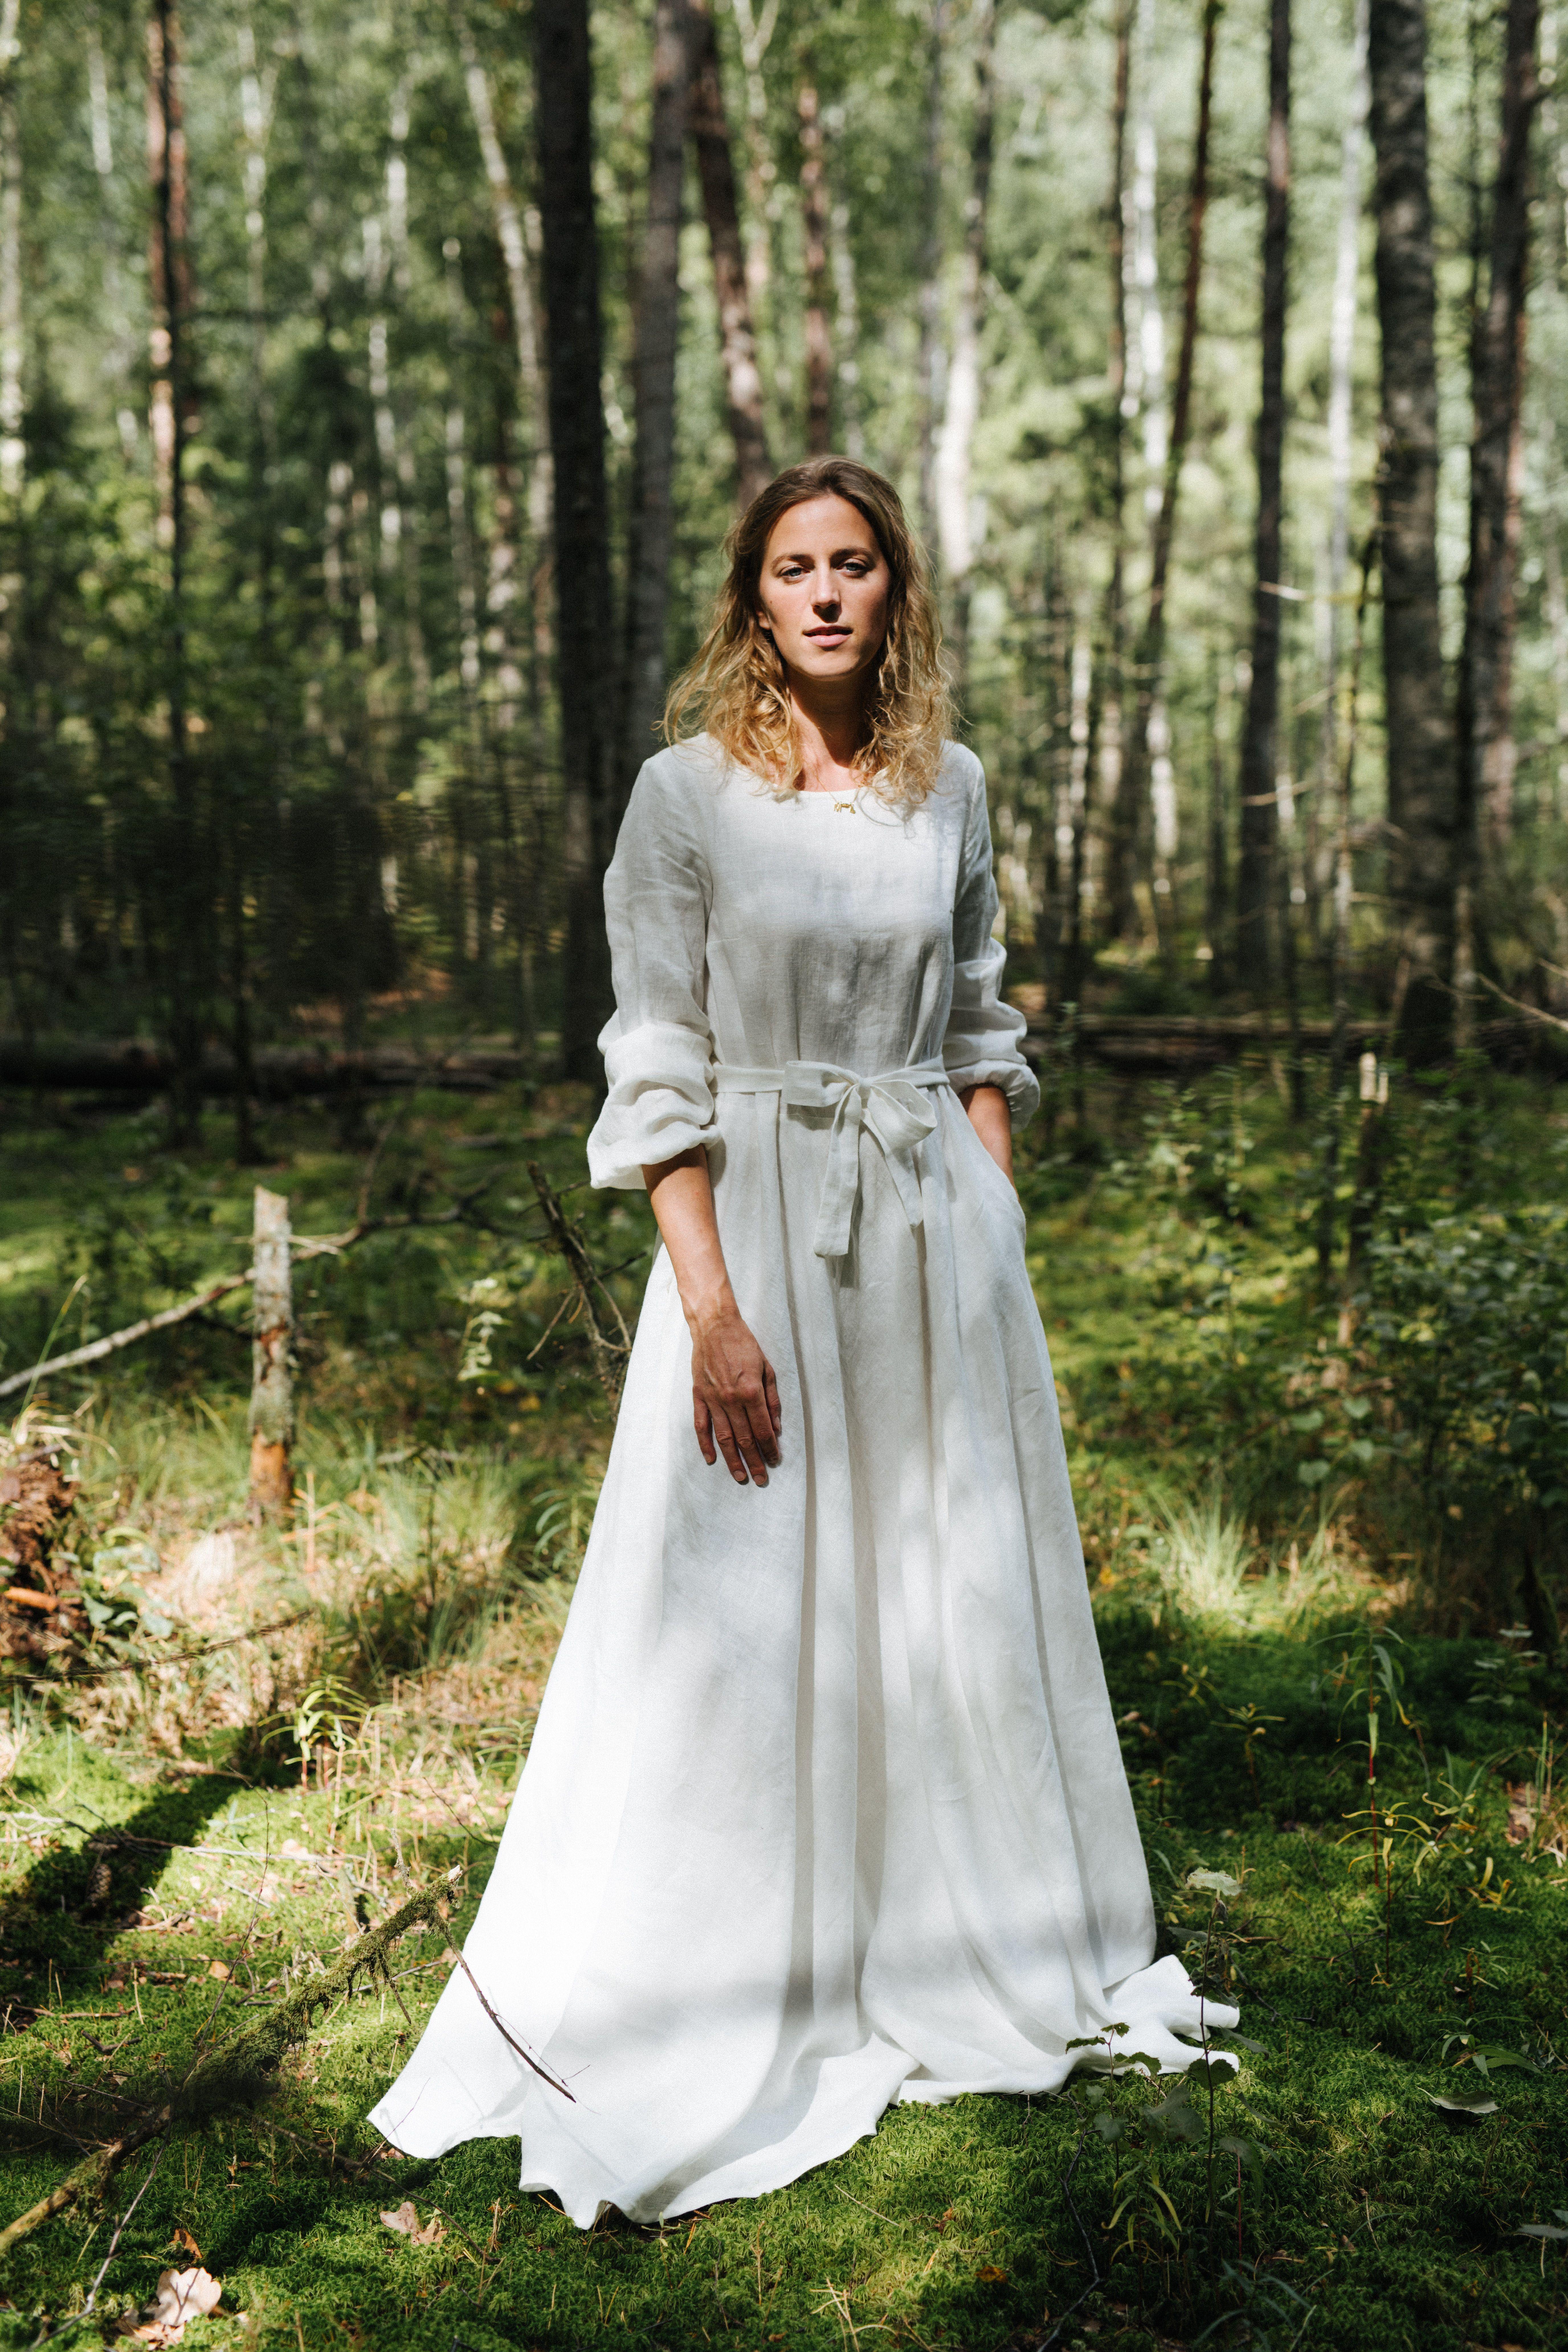 Los Angeles Dress Boho Wedding Dress Linen Wedding Dress Etsy In 2020 Linen Wedding Dress Linen Dresses Etsy Wedding Dress